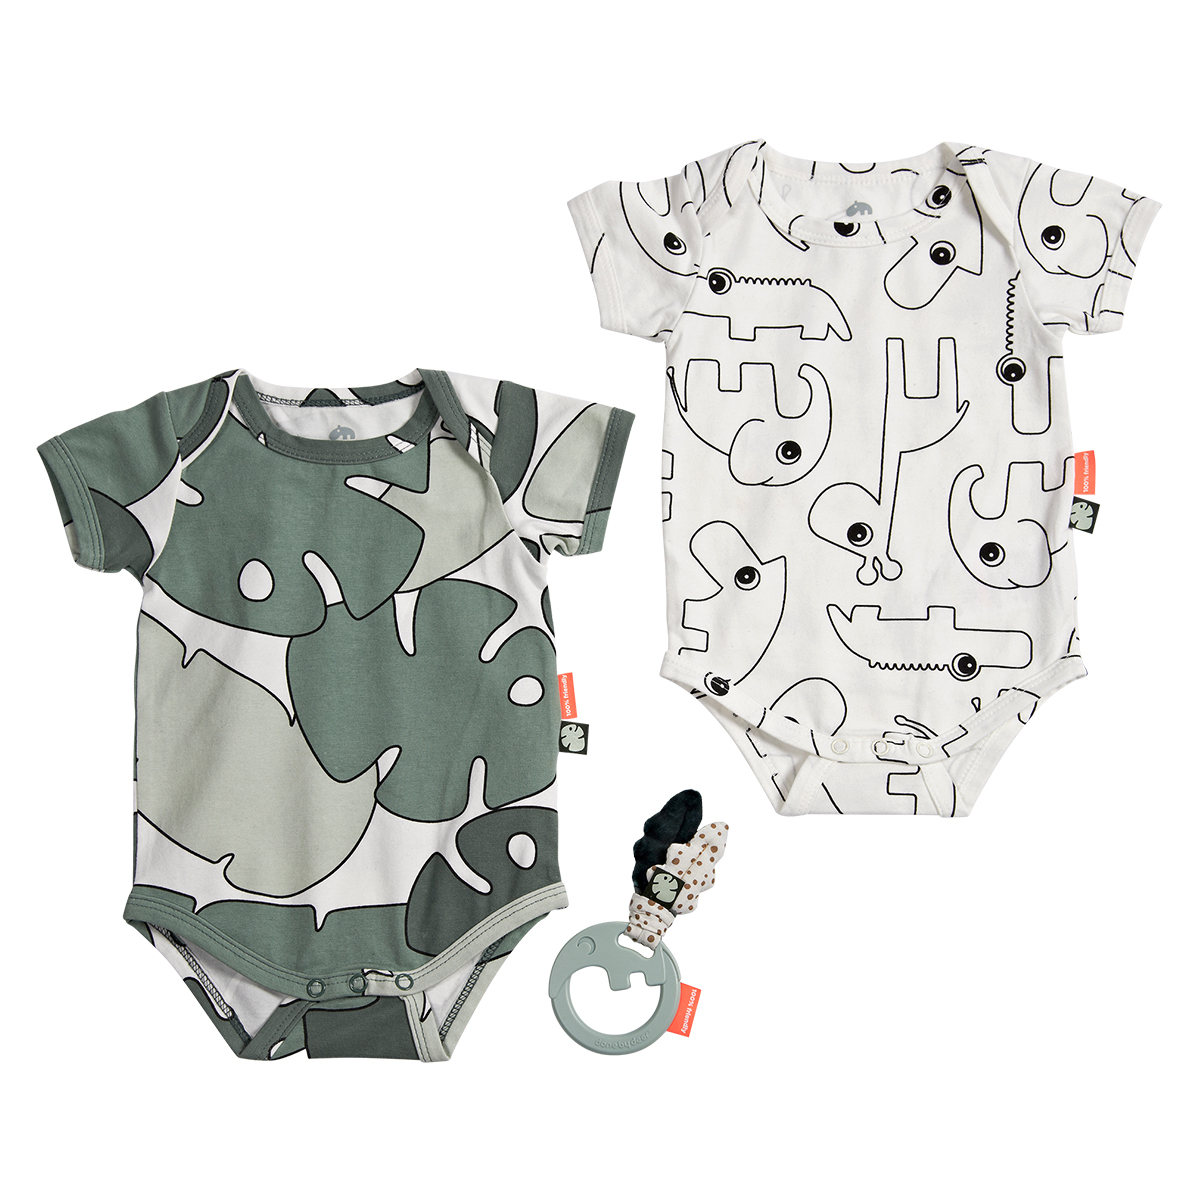 Body & Pyjama Lot de 2 Bodys + Hochet Tiny Tropics - 0-3 mois (56/62cm) Lot de 2 Bodys + Hochet Tiny Tropics - 0-3 mois (56/62cm)